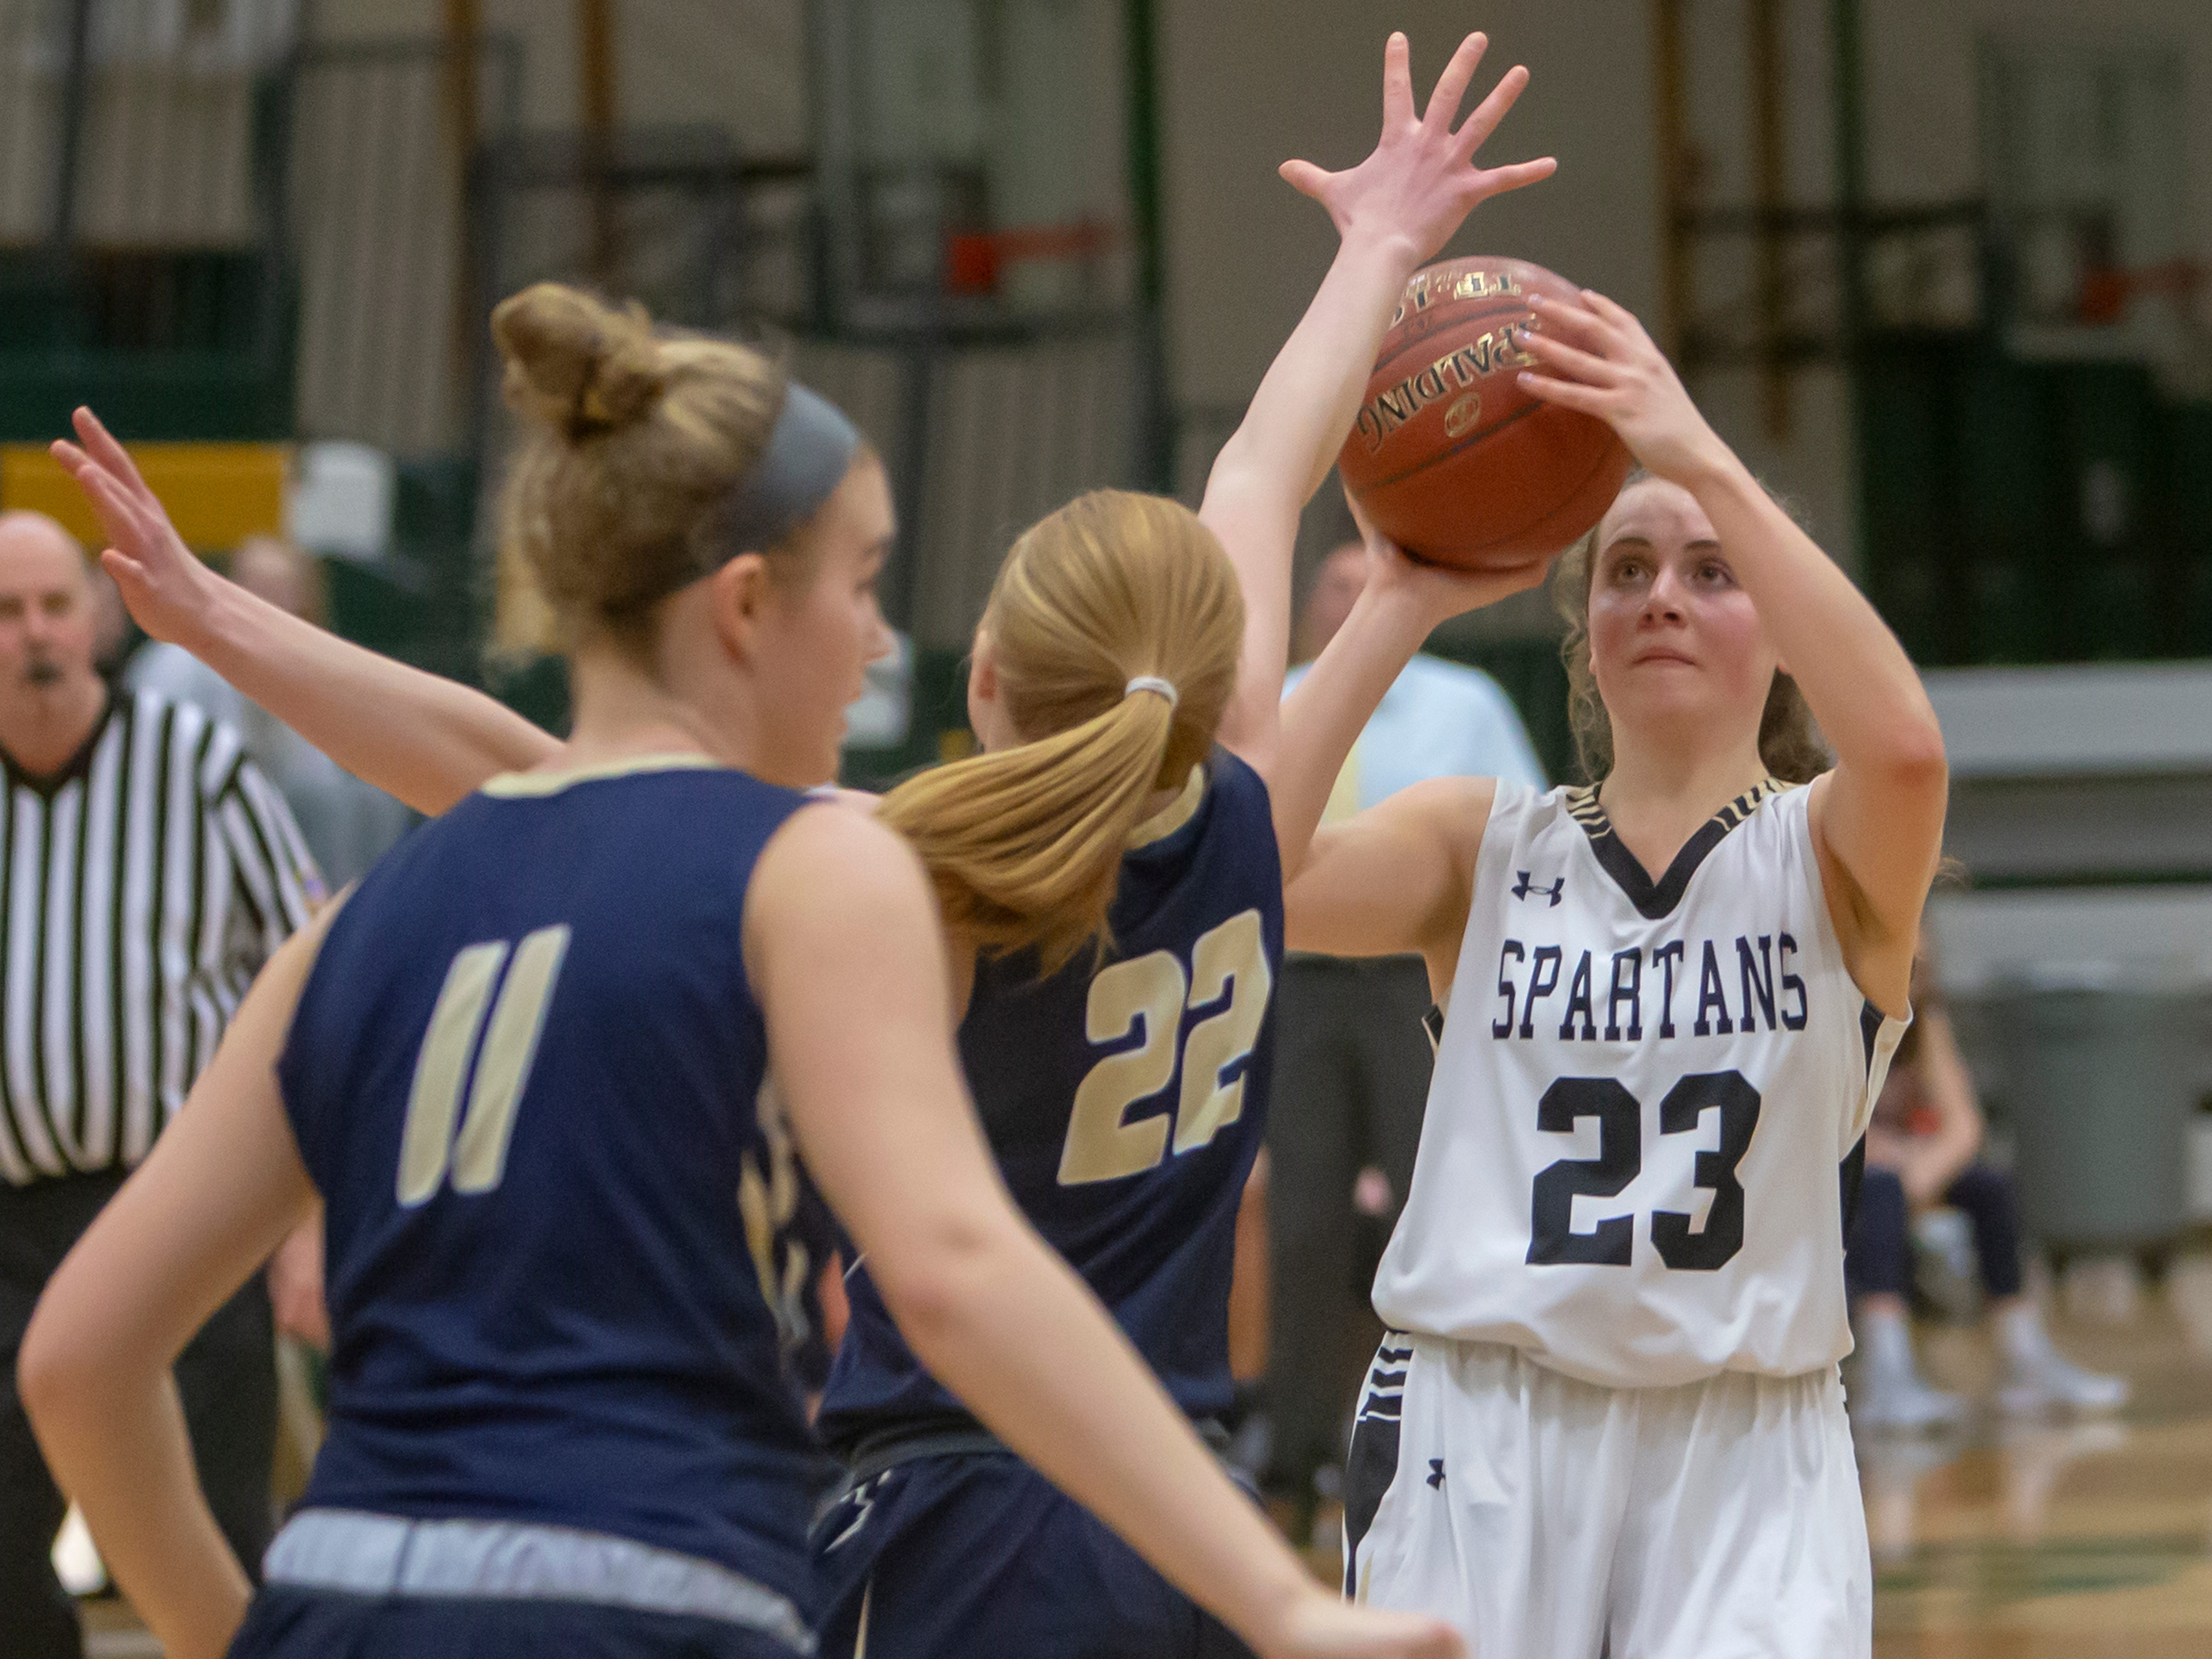 Oshkosh North's Elle Lieder shoots over Appleton North's Kayla Schroeder during a girls basketball game Friday, February 8, 2019, in Oshkosh, Wis., at Oshkosh North High School.